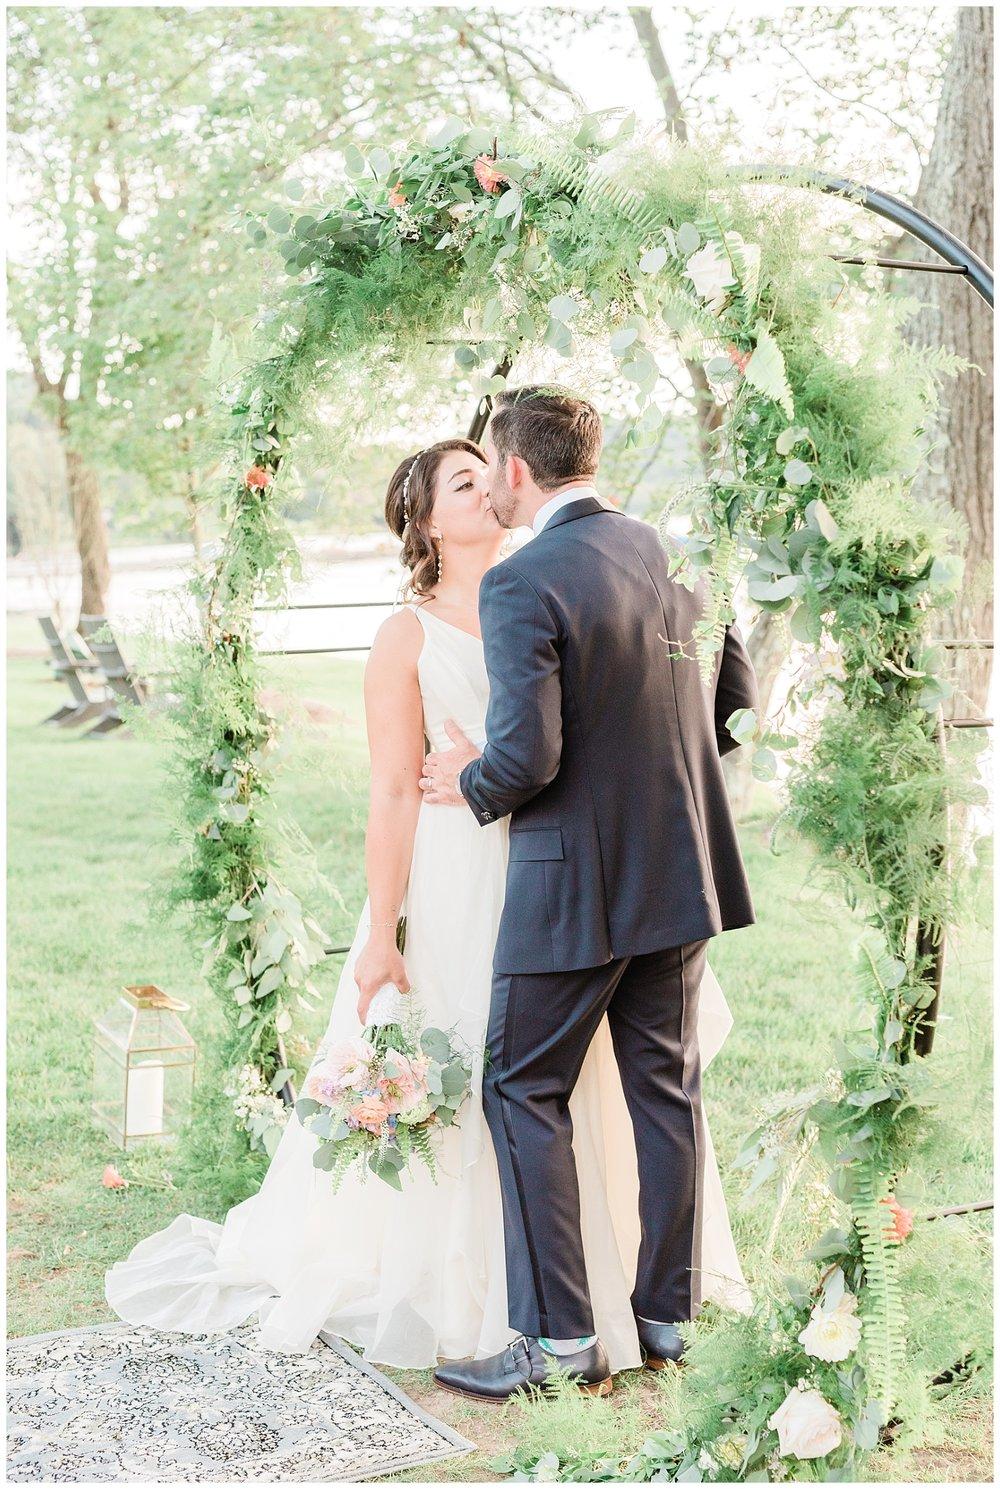 Indian-Trail-Club-Franklin-Lakes-NJ-Summer-Stylish-Wedding-Photographer-Photo-_0176.jpg